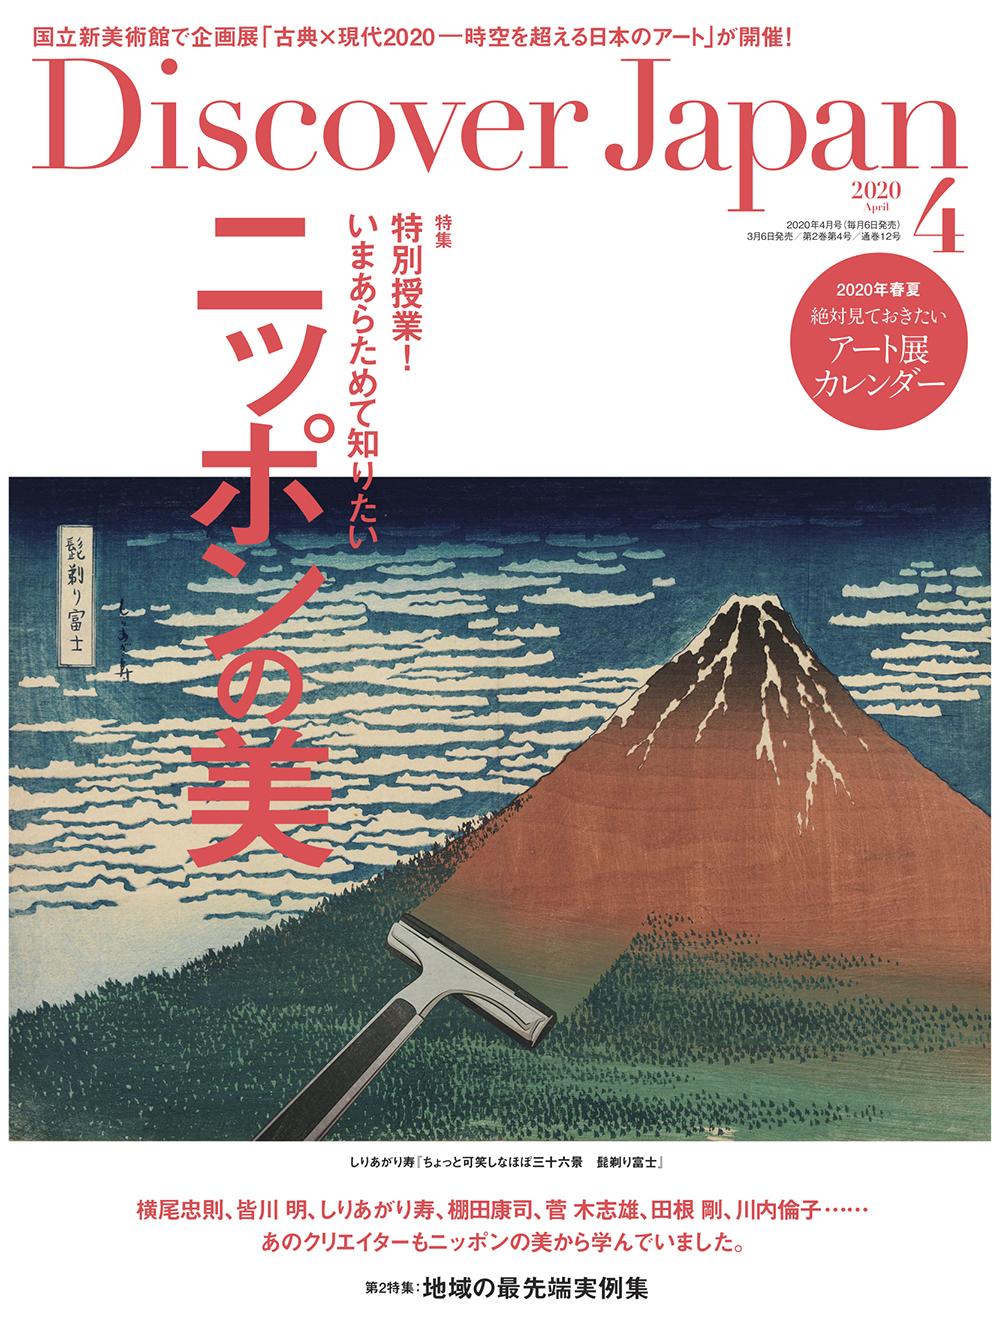 541_Discover Japan_2020APR